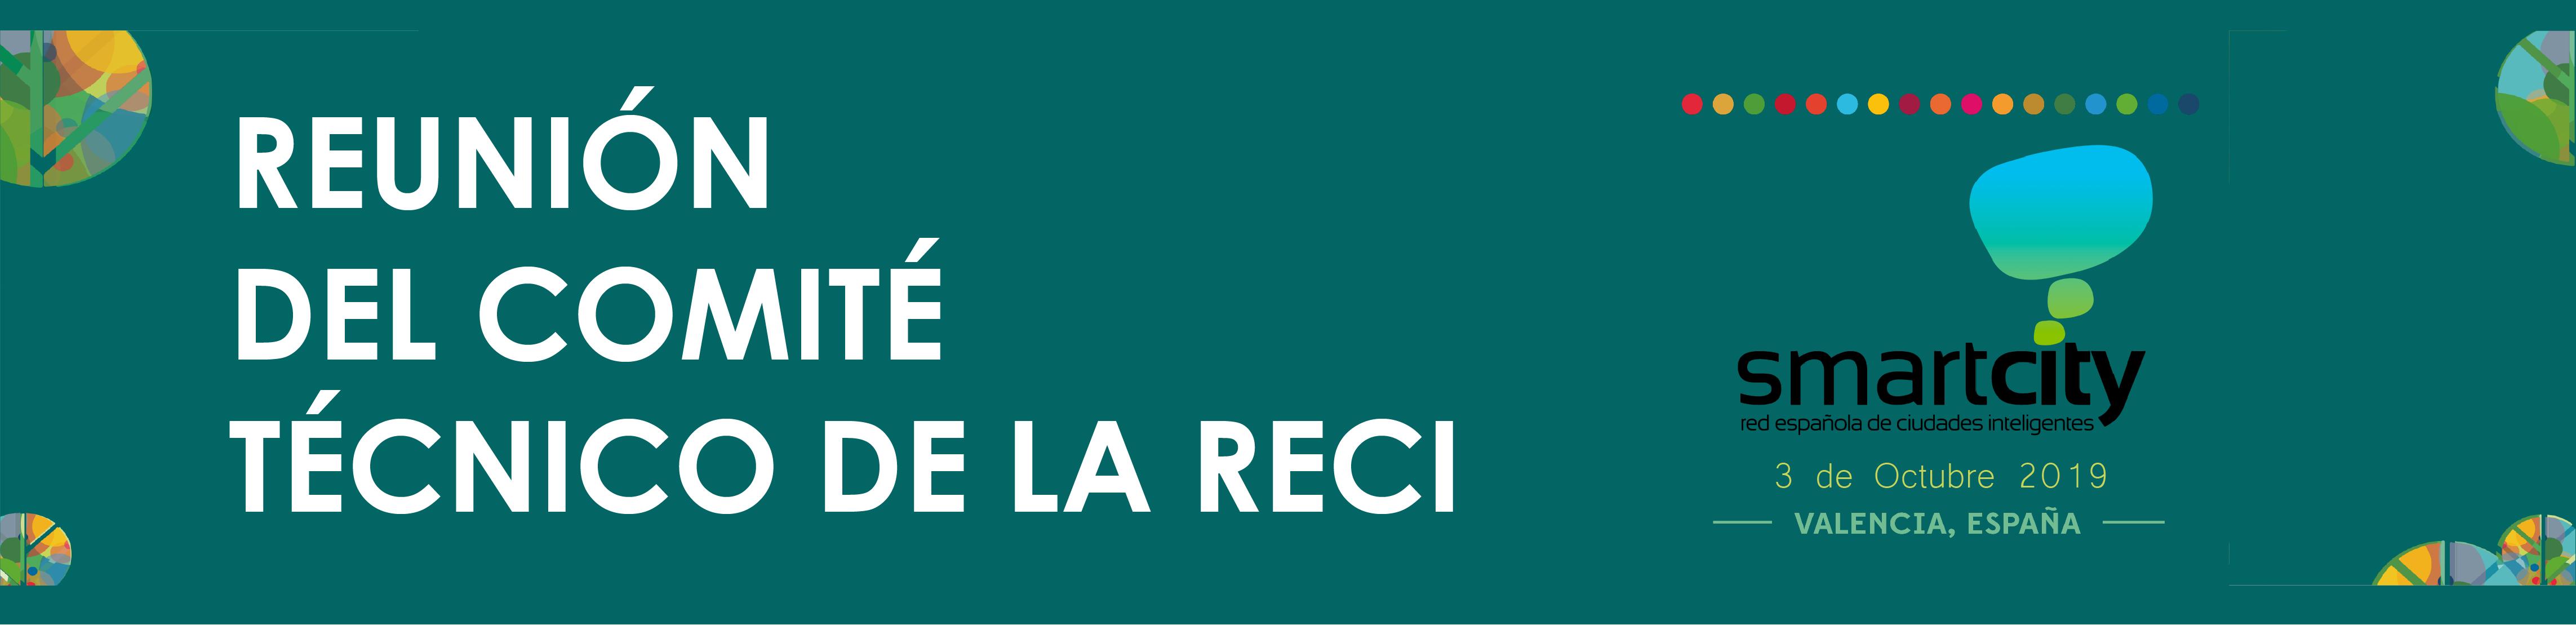 Reunión del Comité Técnico de la RECI